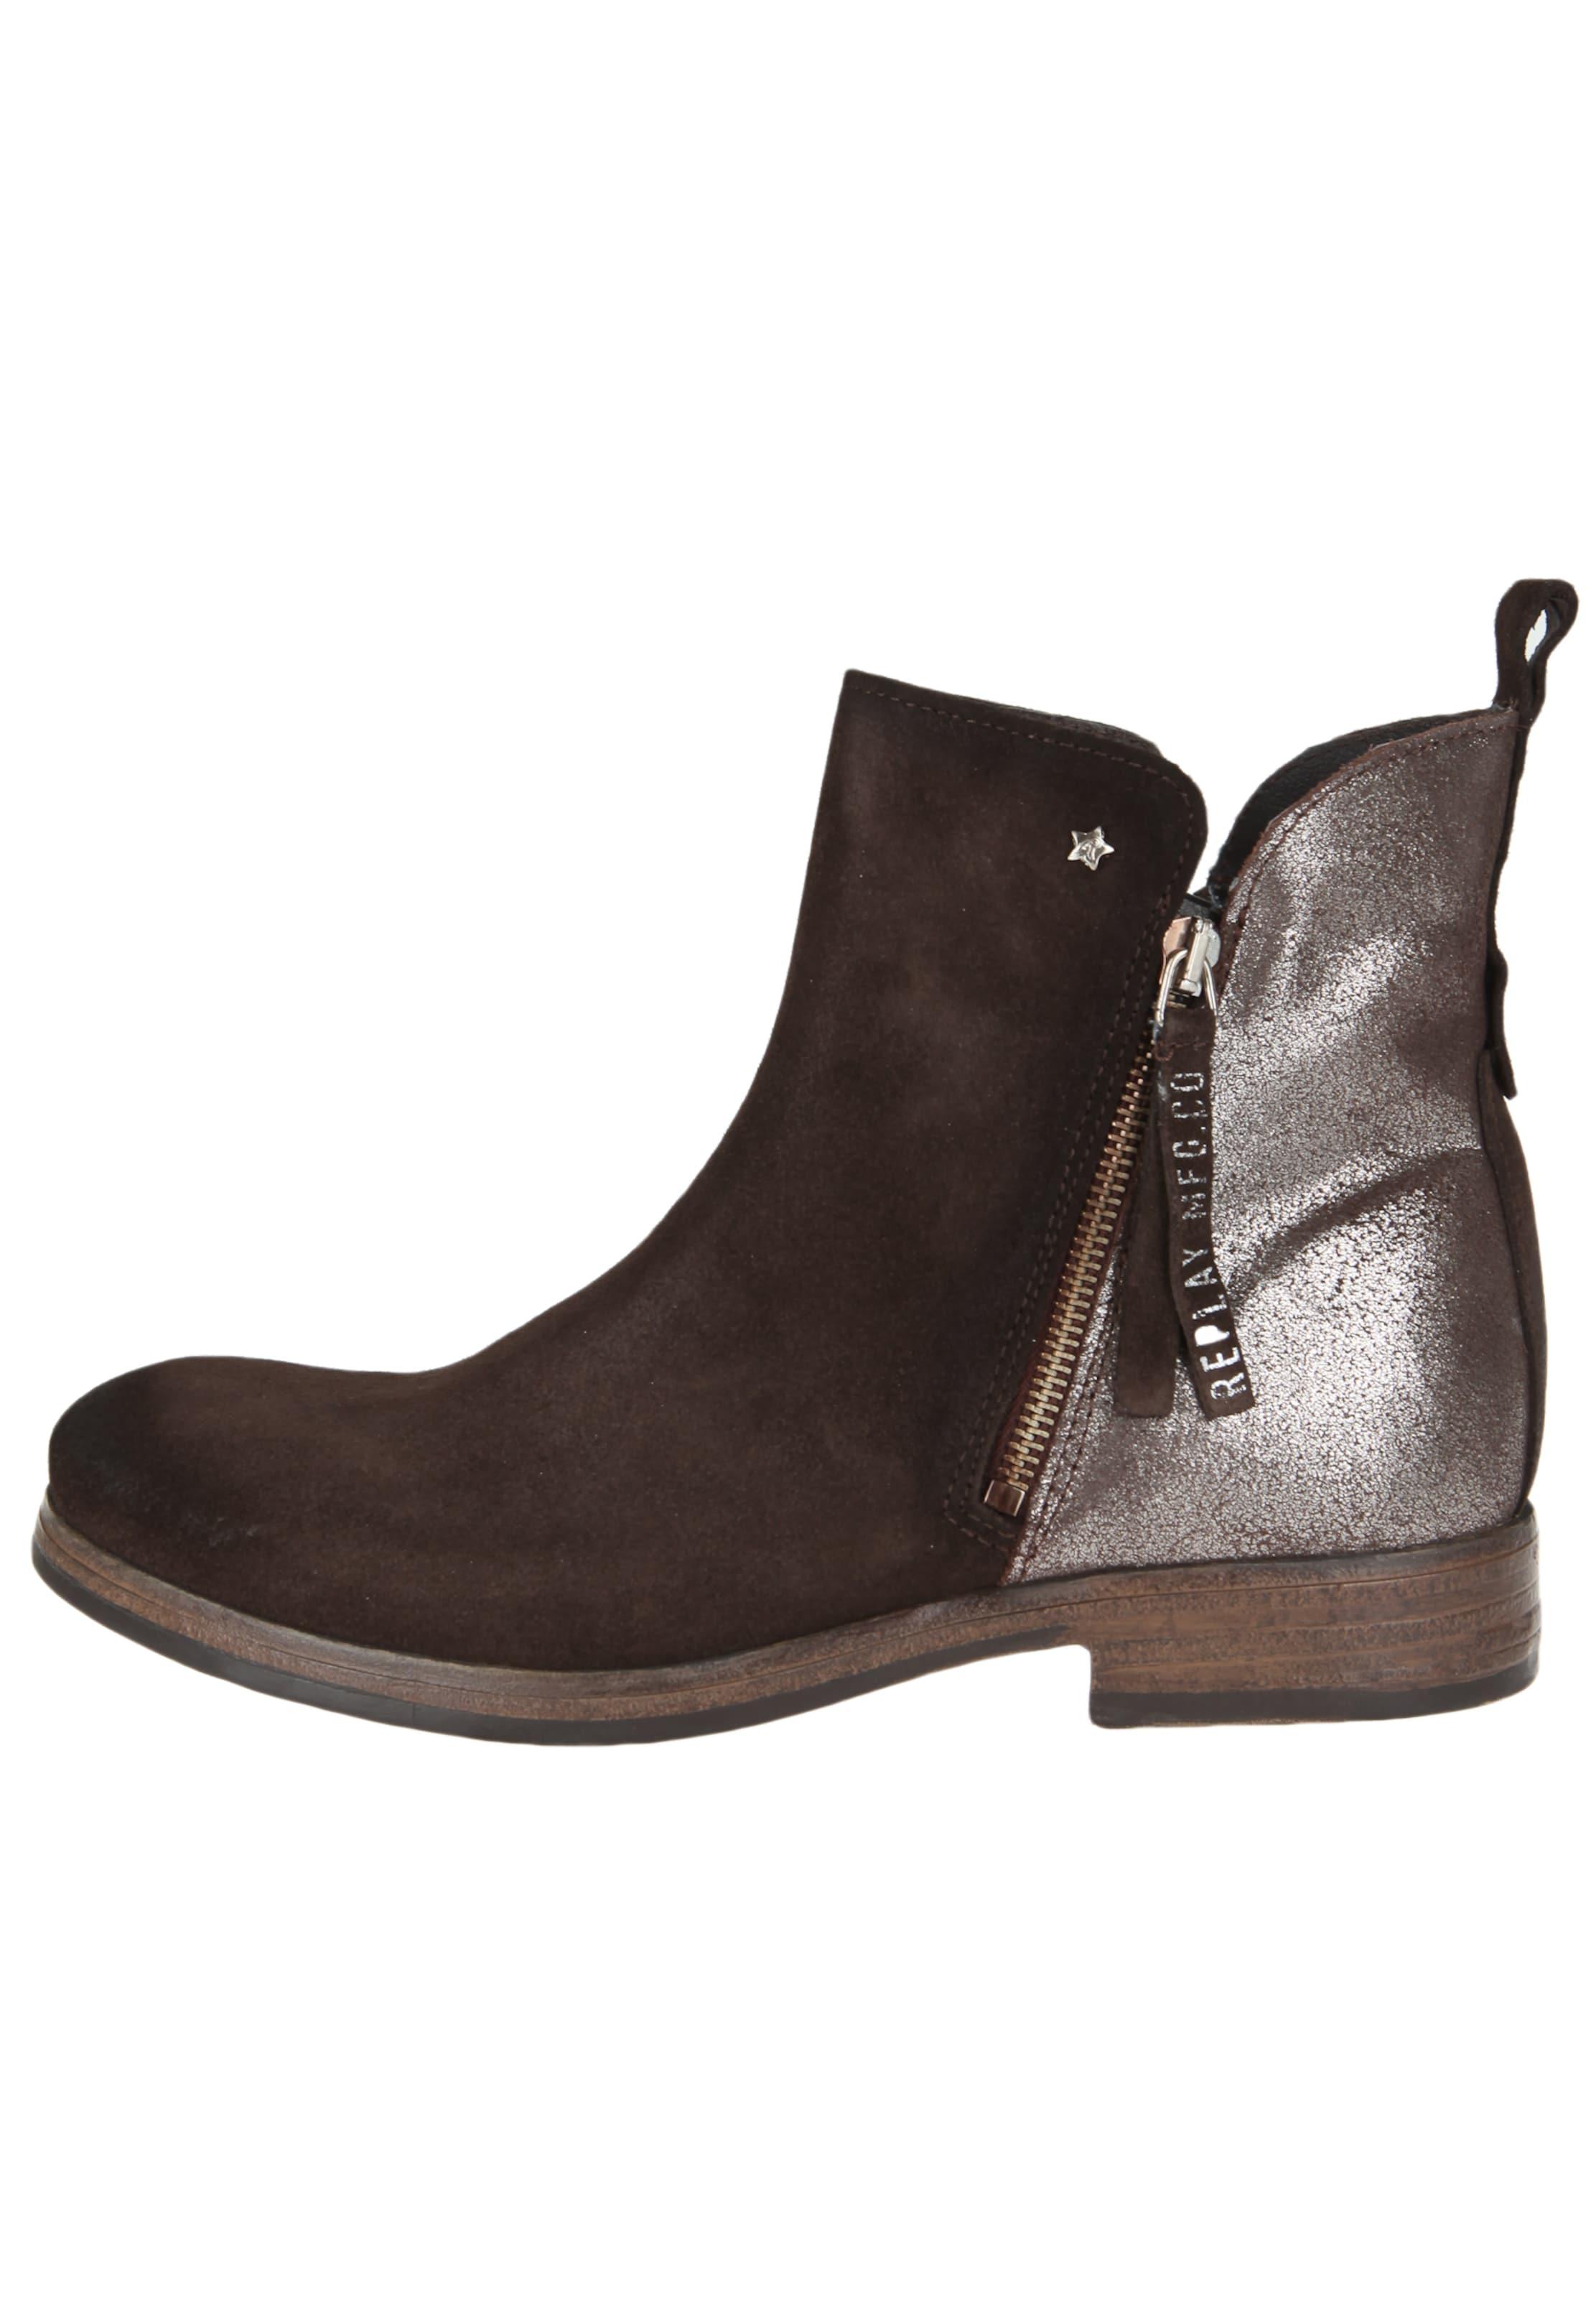 REPLAY Lederstiefelette VALERIE Verschleißfeste billige Schuhe